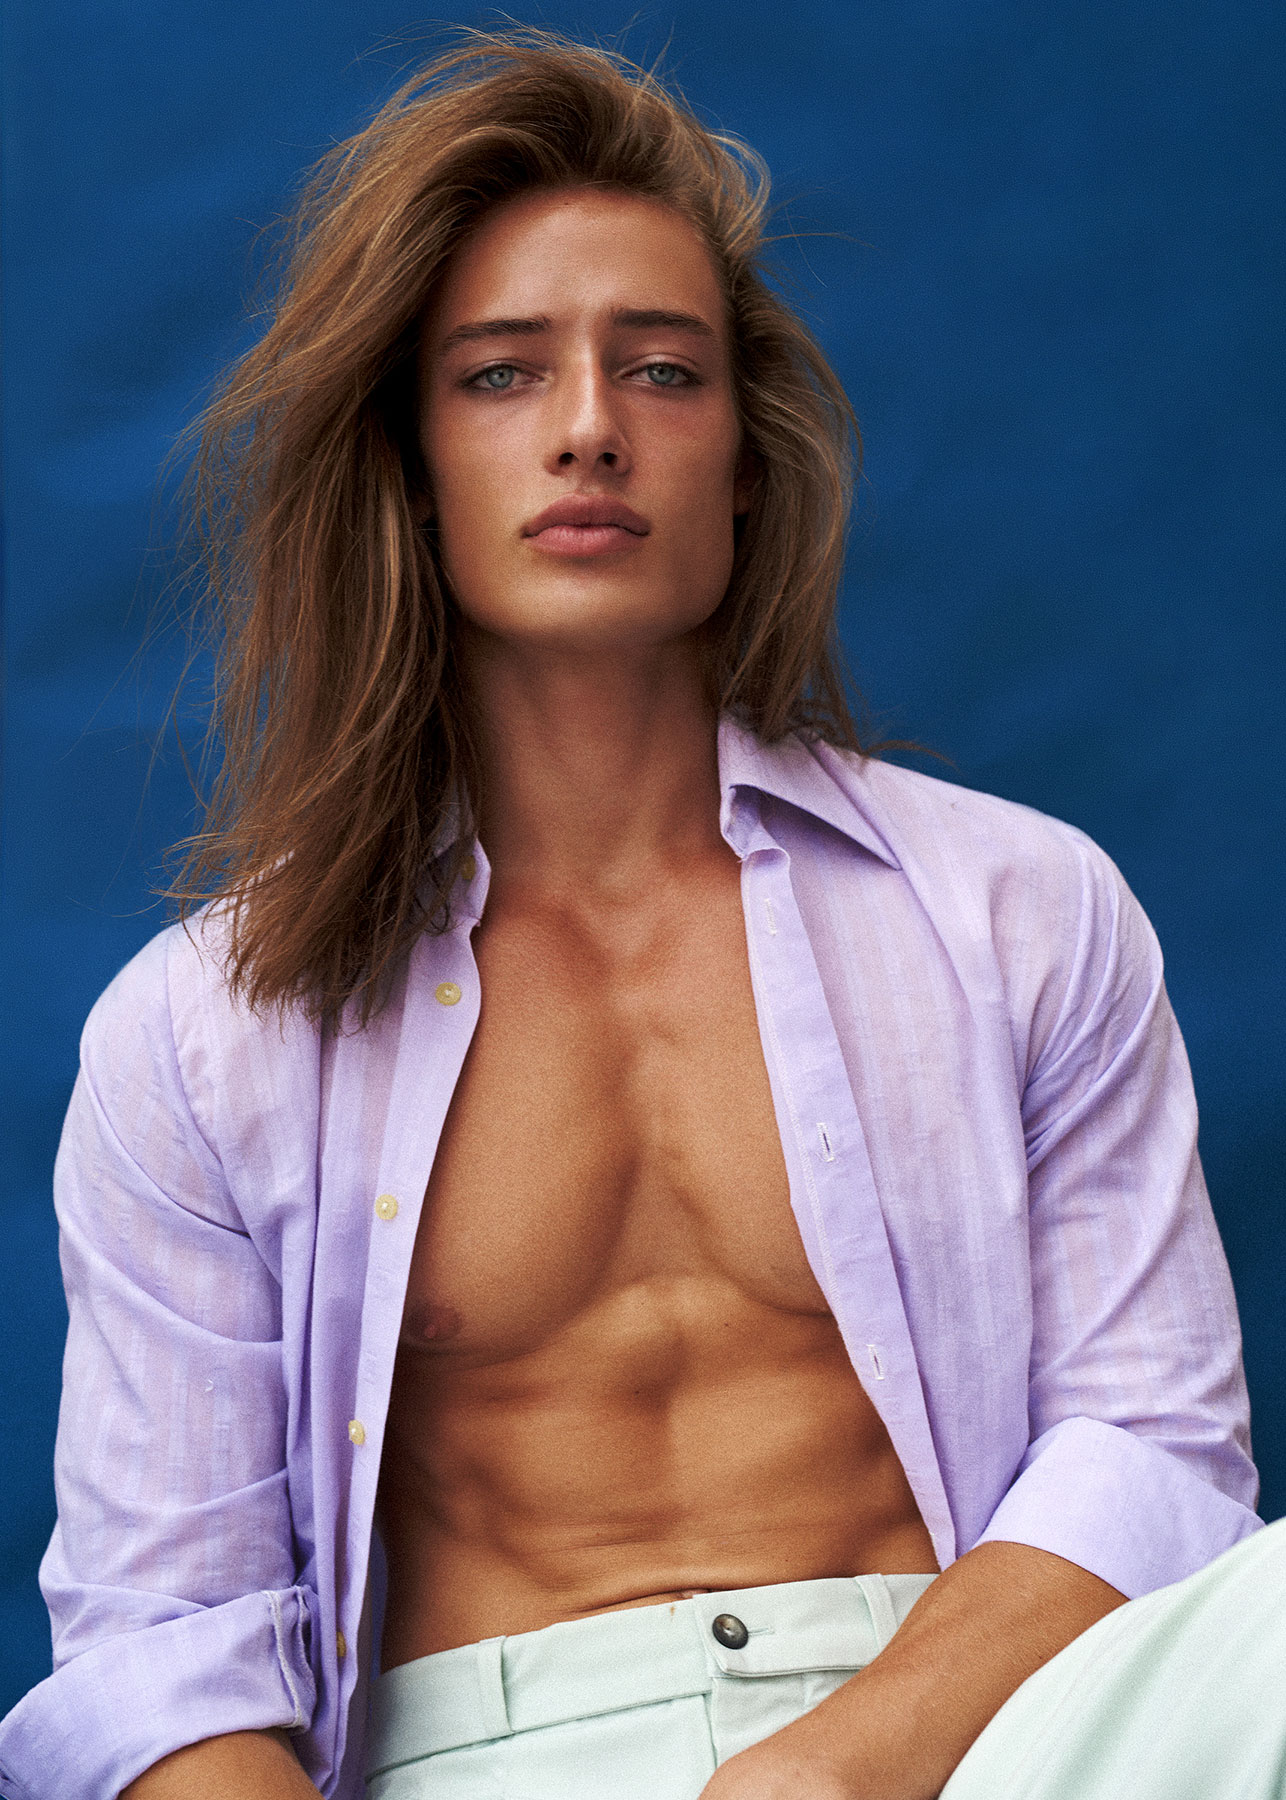 men beauty editorial